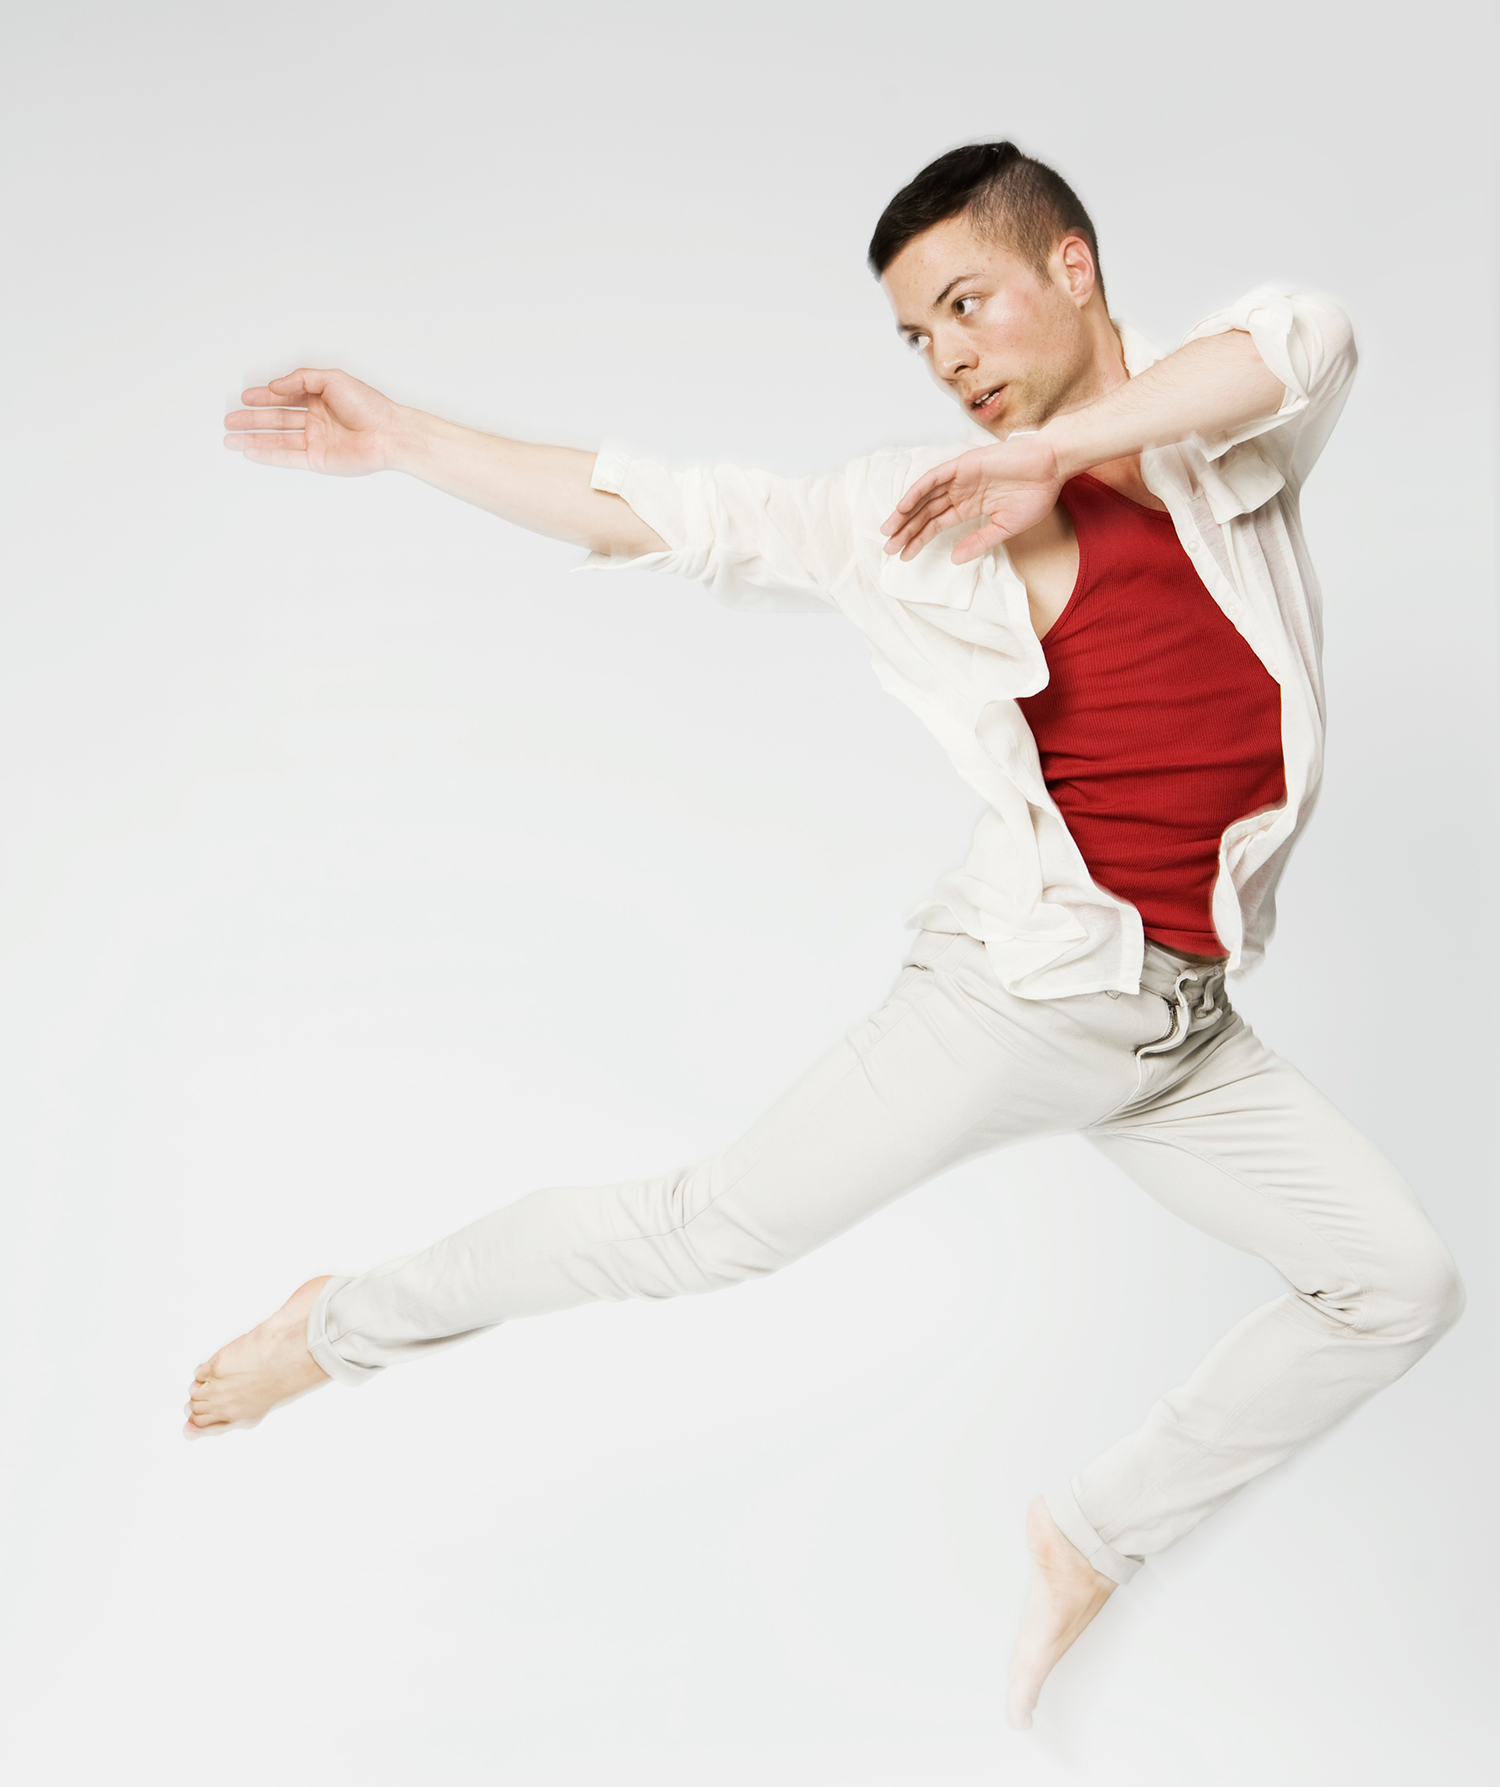 Dublin Youth Dance Company